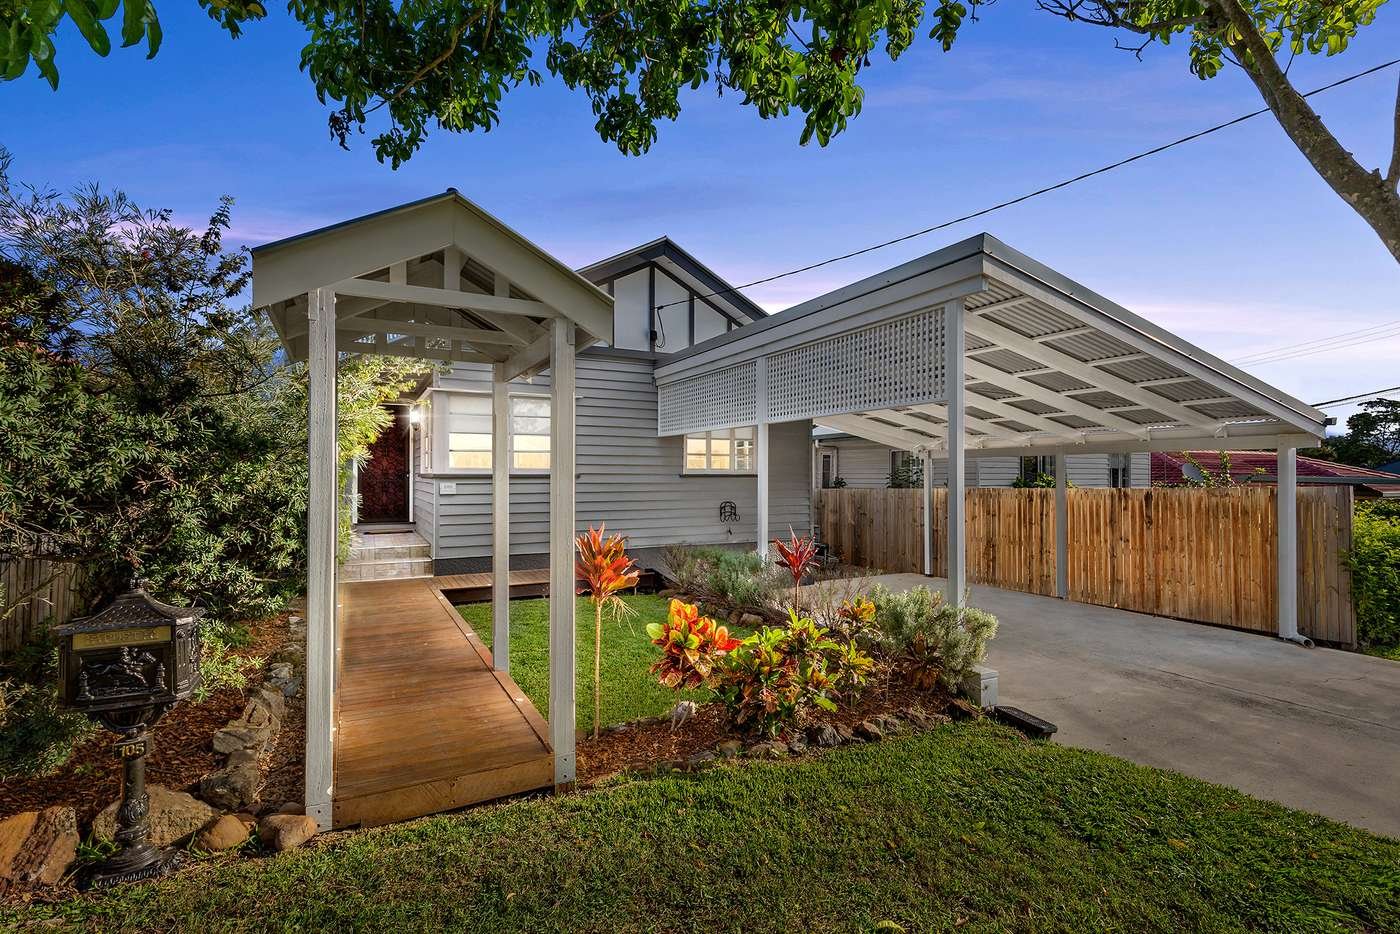 Main view of Homely house listing, 105 Lumley Street, Upper Mount Gravatt QLD 4122